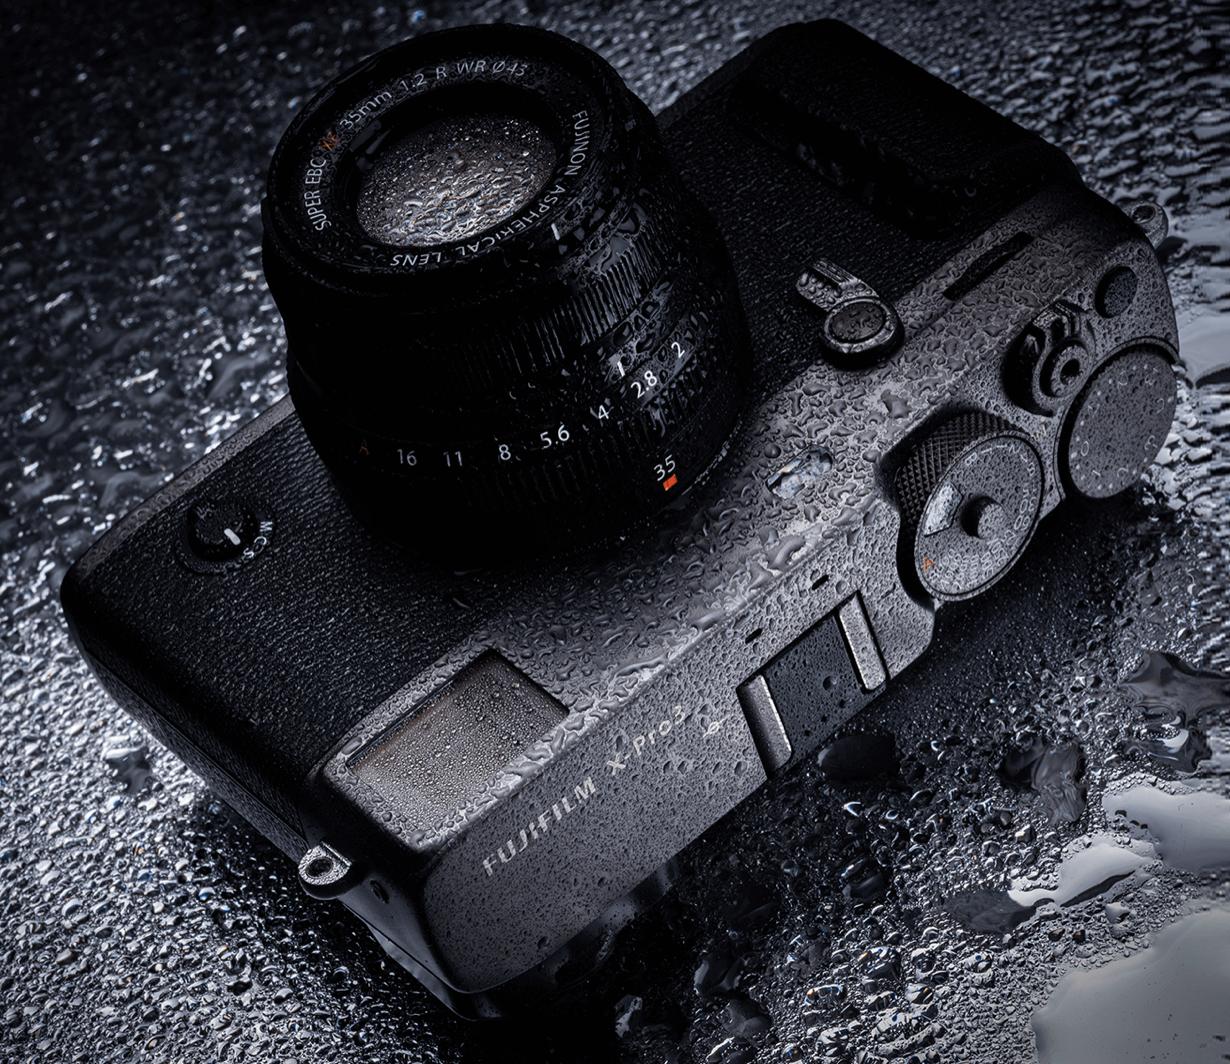 Image Fujifilm